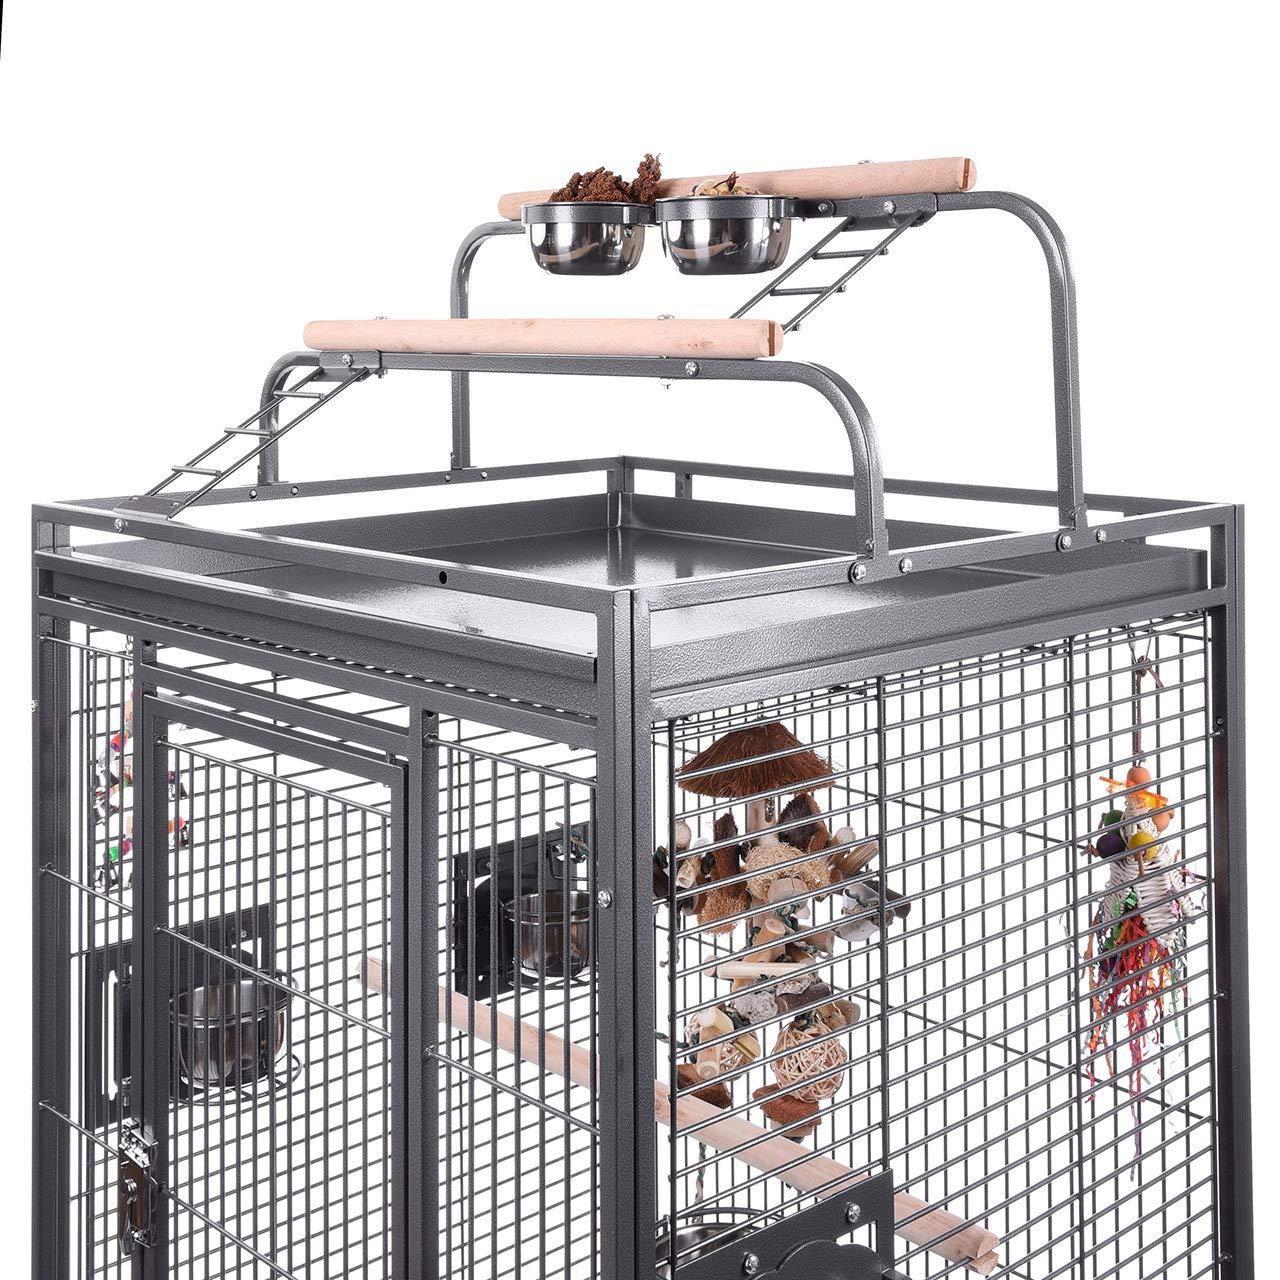 Montana Finca II Play jaula de alambre de metal con revestimiento ...